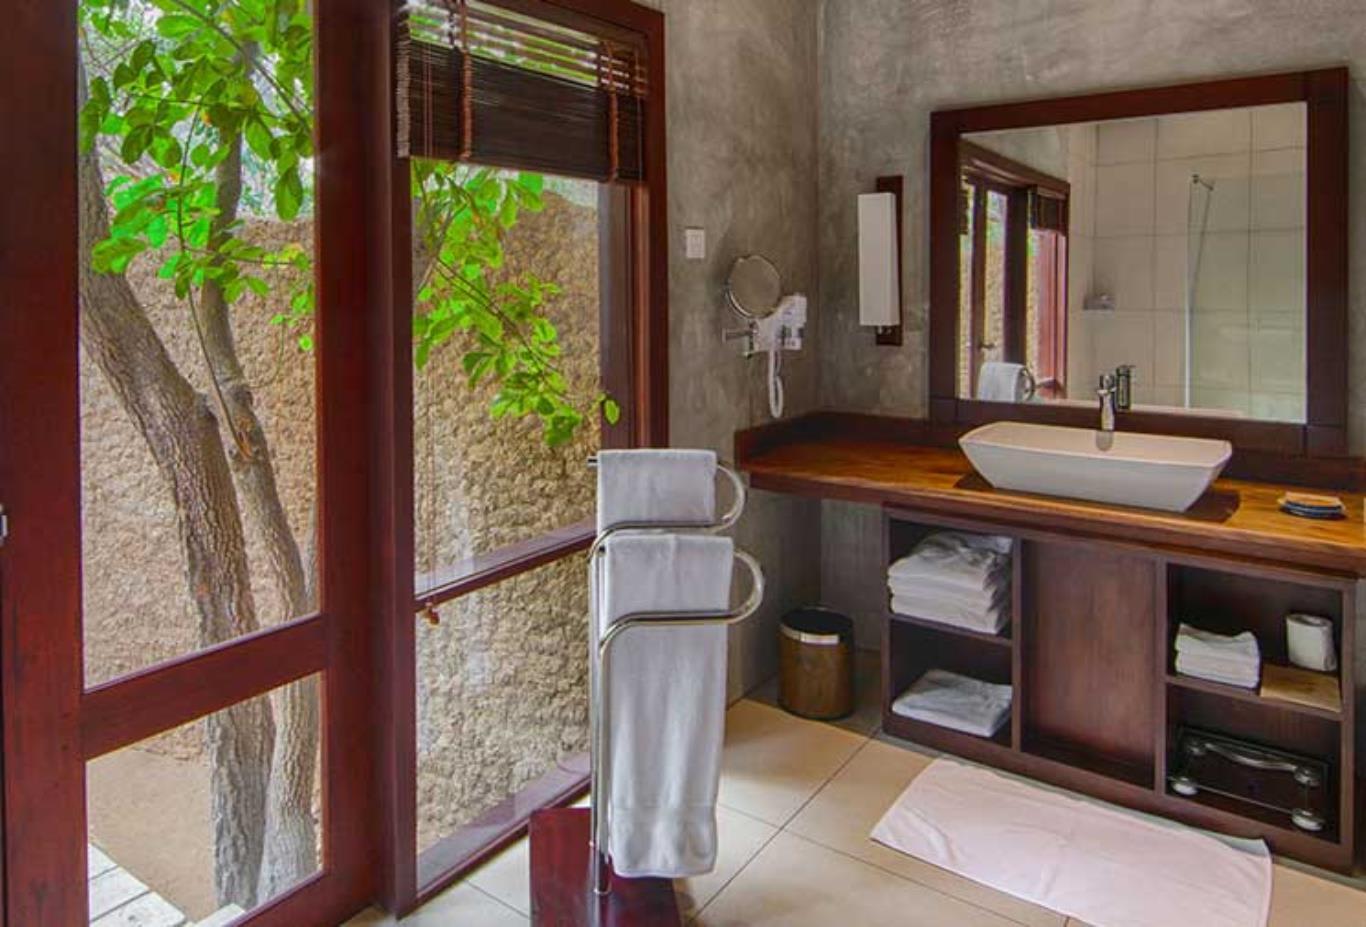 Beach Cabin Bathroom